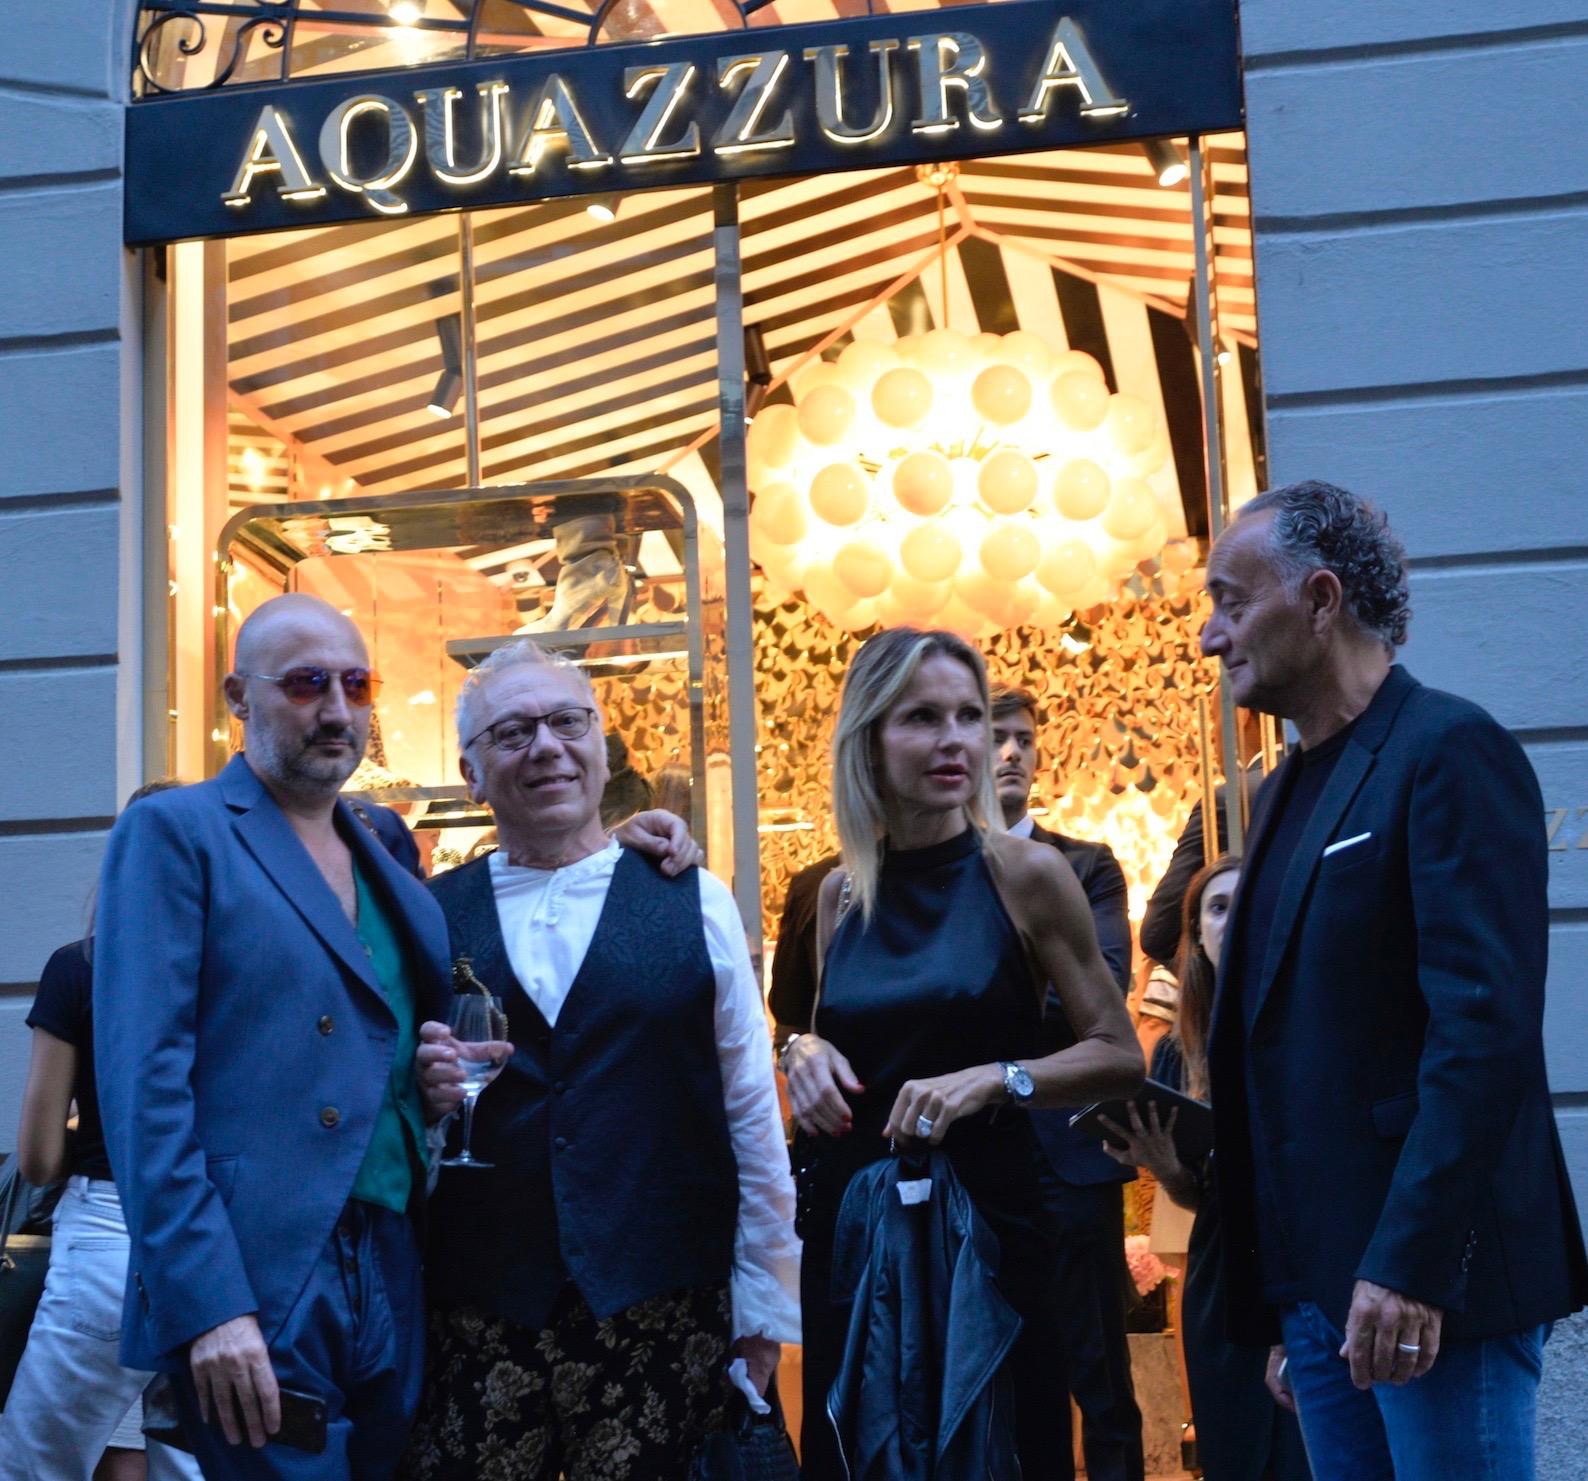 milano fashion week Aquazzura 5